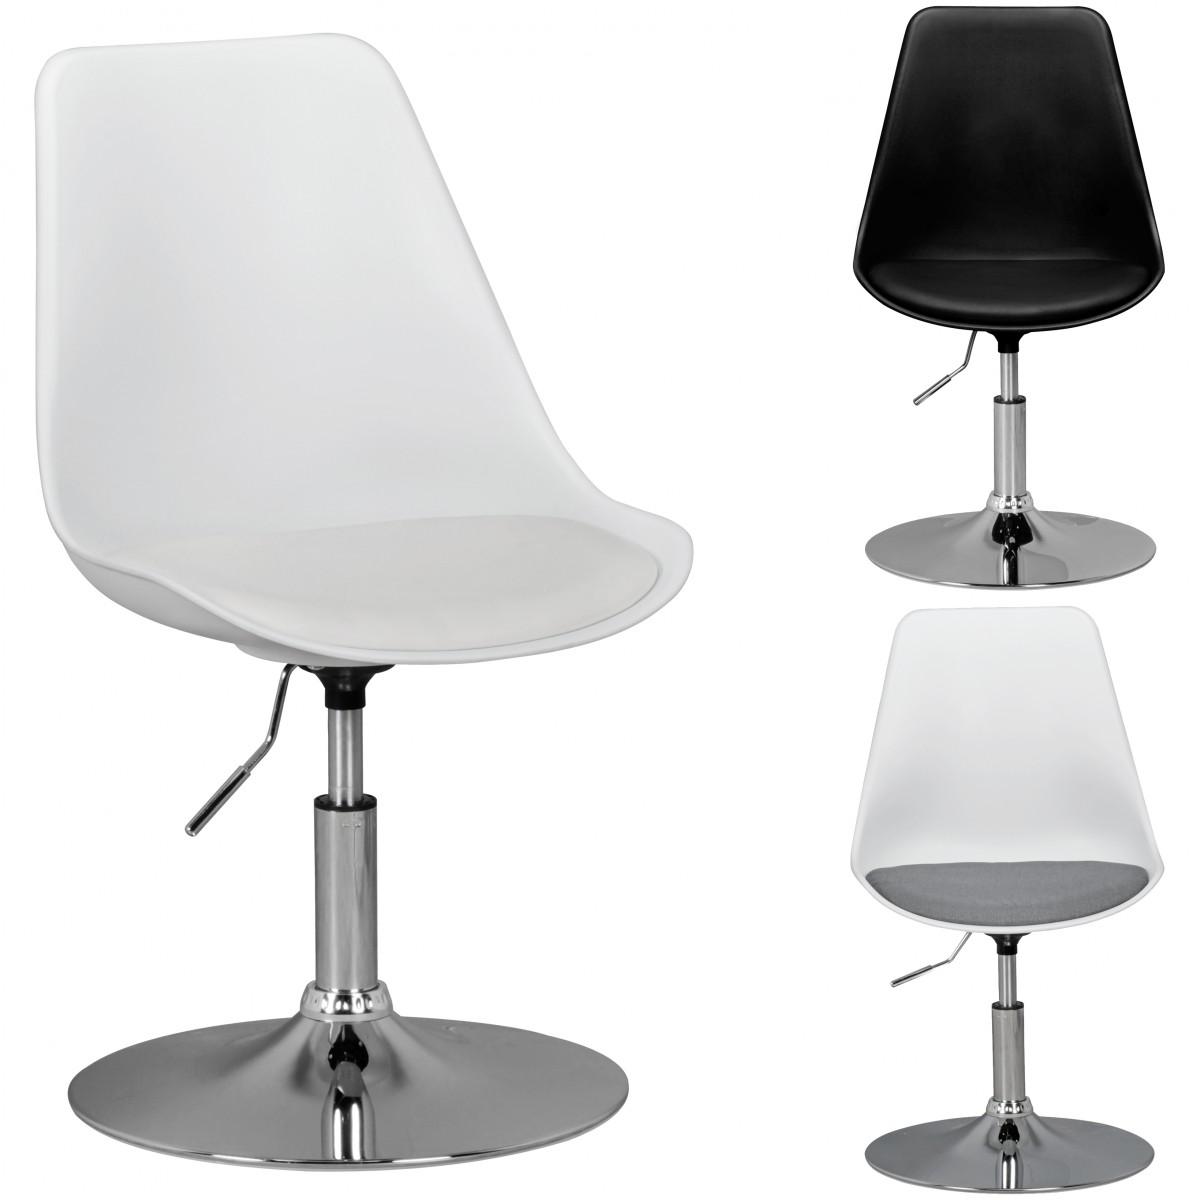 Drehsessel h henverstellbar design drehstuhl for Esszimmerstuhl drehbar